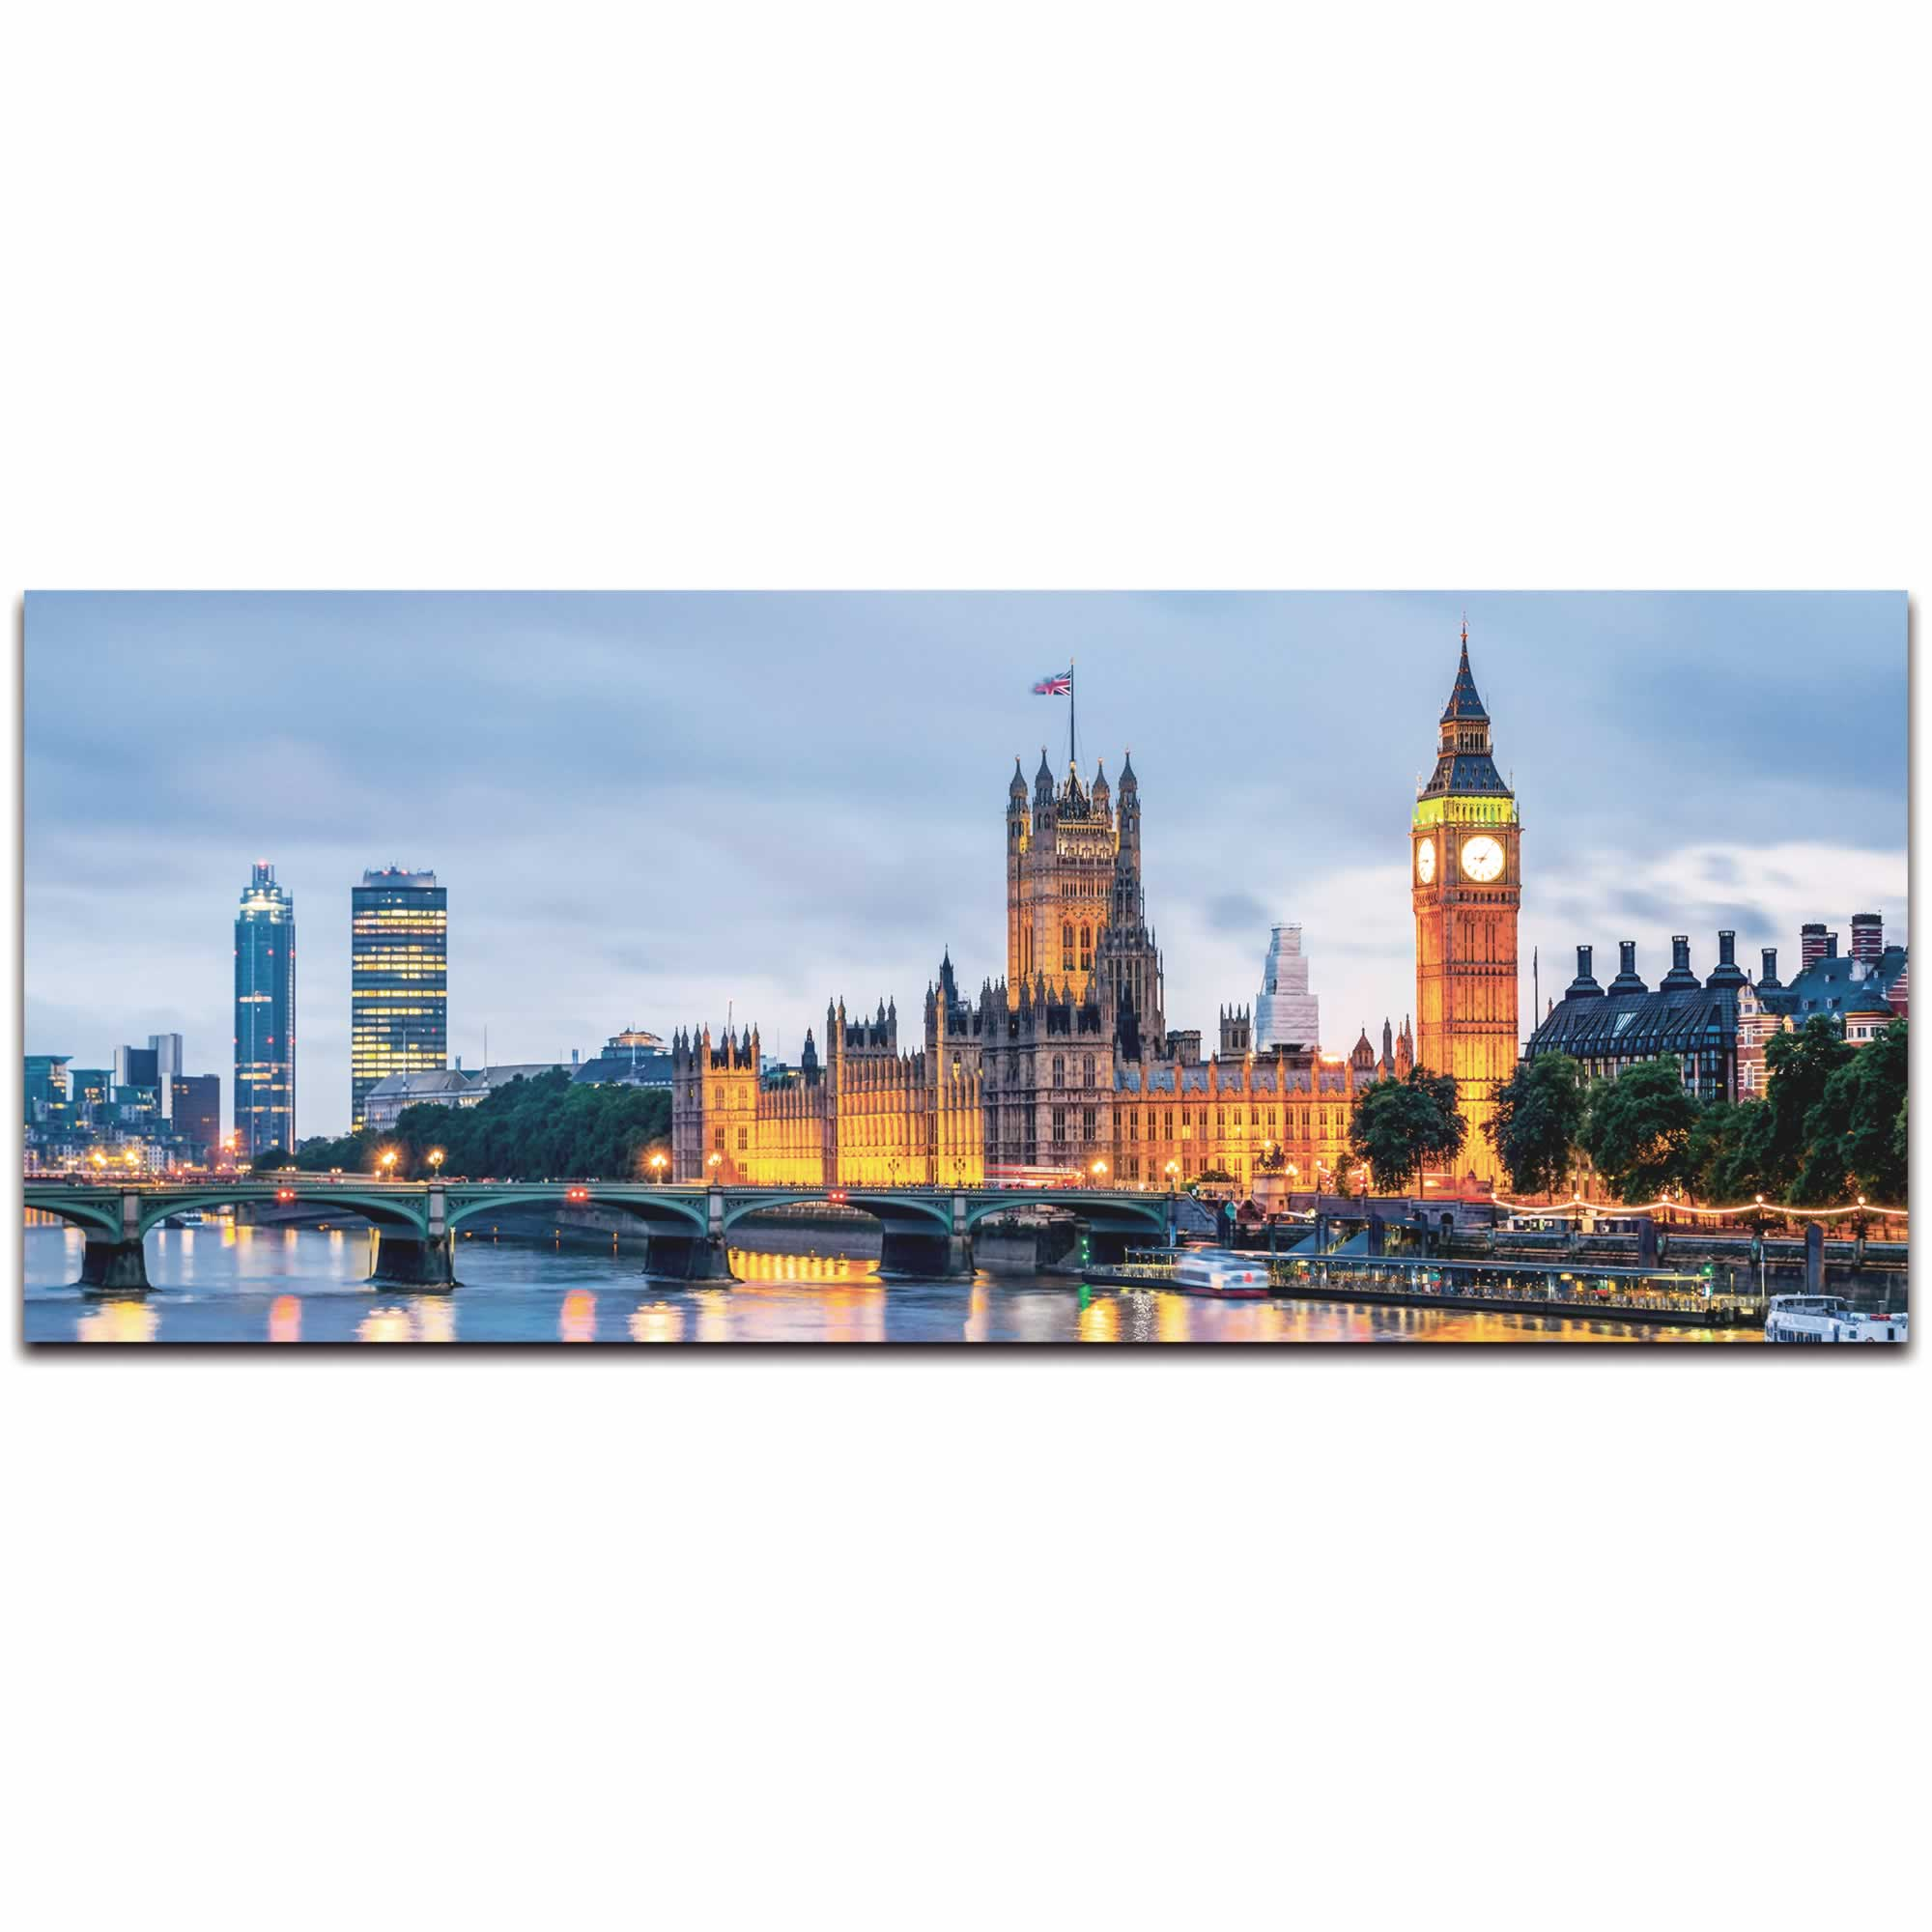 Classic London City Skyline - Urban Modern Art, Designer Home Decor, Cityscape Wall Artwork, Trendy Contemporary Art - Alternate View 2